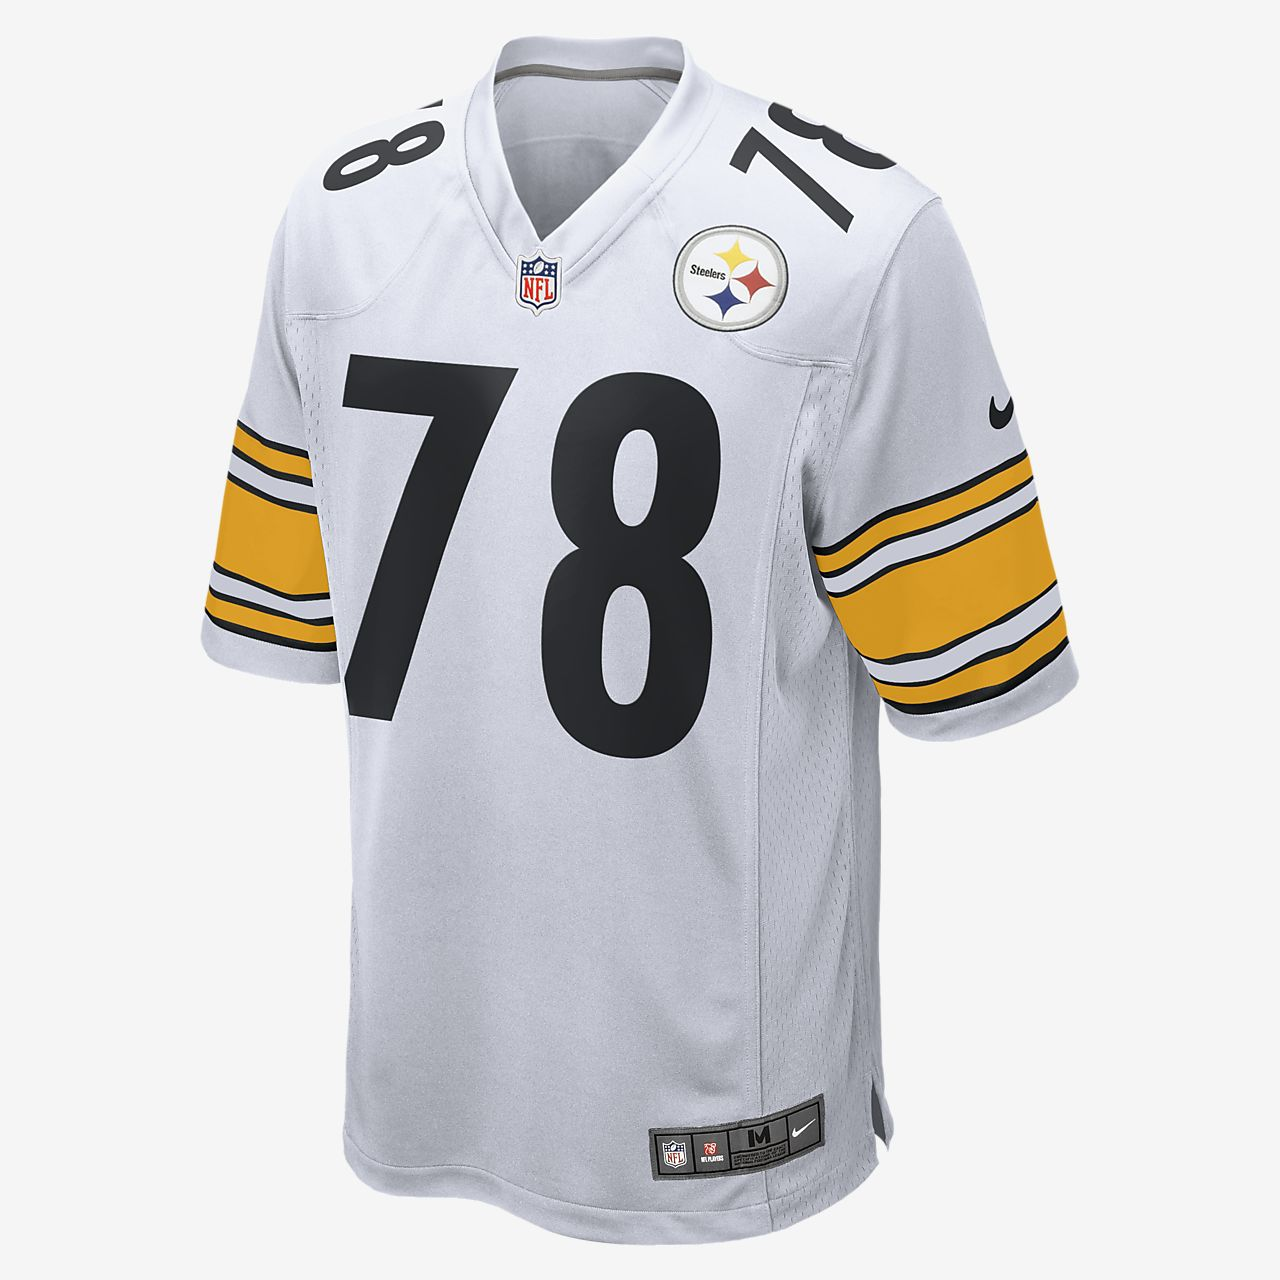 info for 9299e e6f21 NFL Pittsburgh Steelers (Alejandro Villanueva) Men's Football Away Game  Jersey